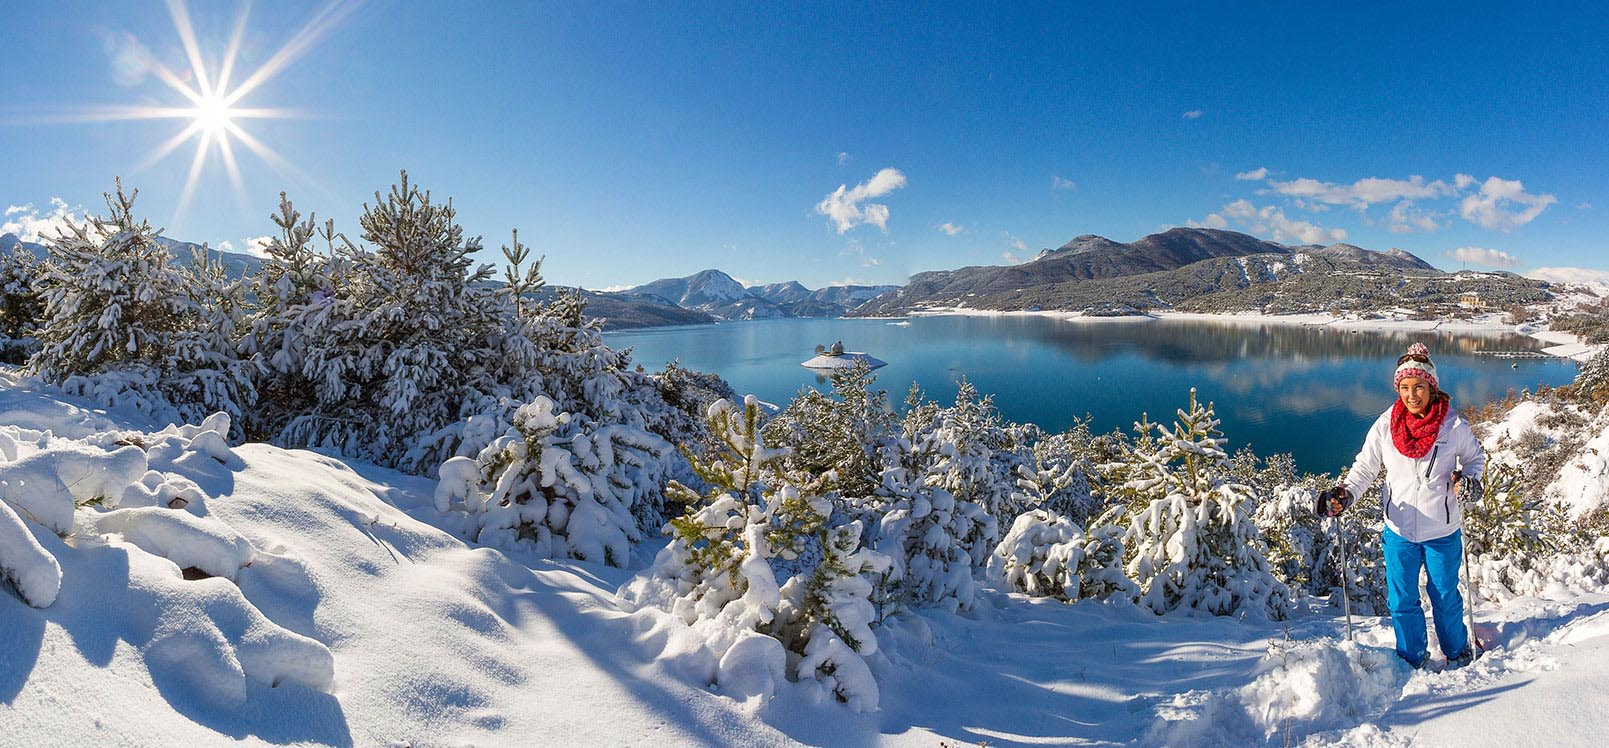 Lac de Serre-Ponçon en hiver